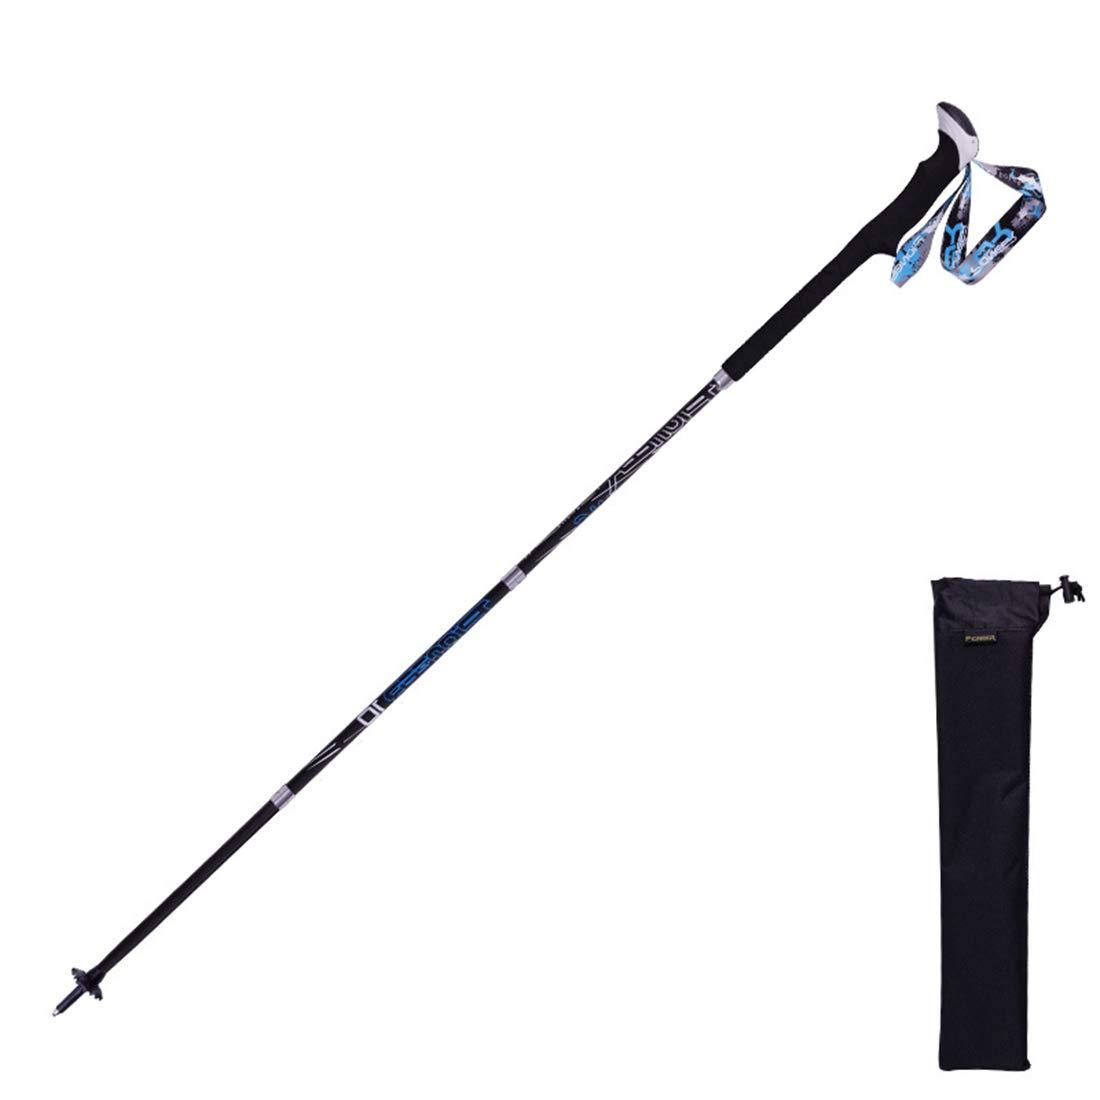 Mifusanahorn Trekking Pole Double Lock Ultraleichtes Outdoor Sports Teleskop Wandern Kohlefaser Hohe Härte Vier Falten